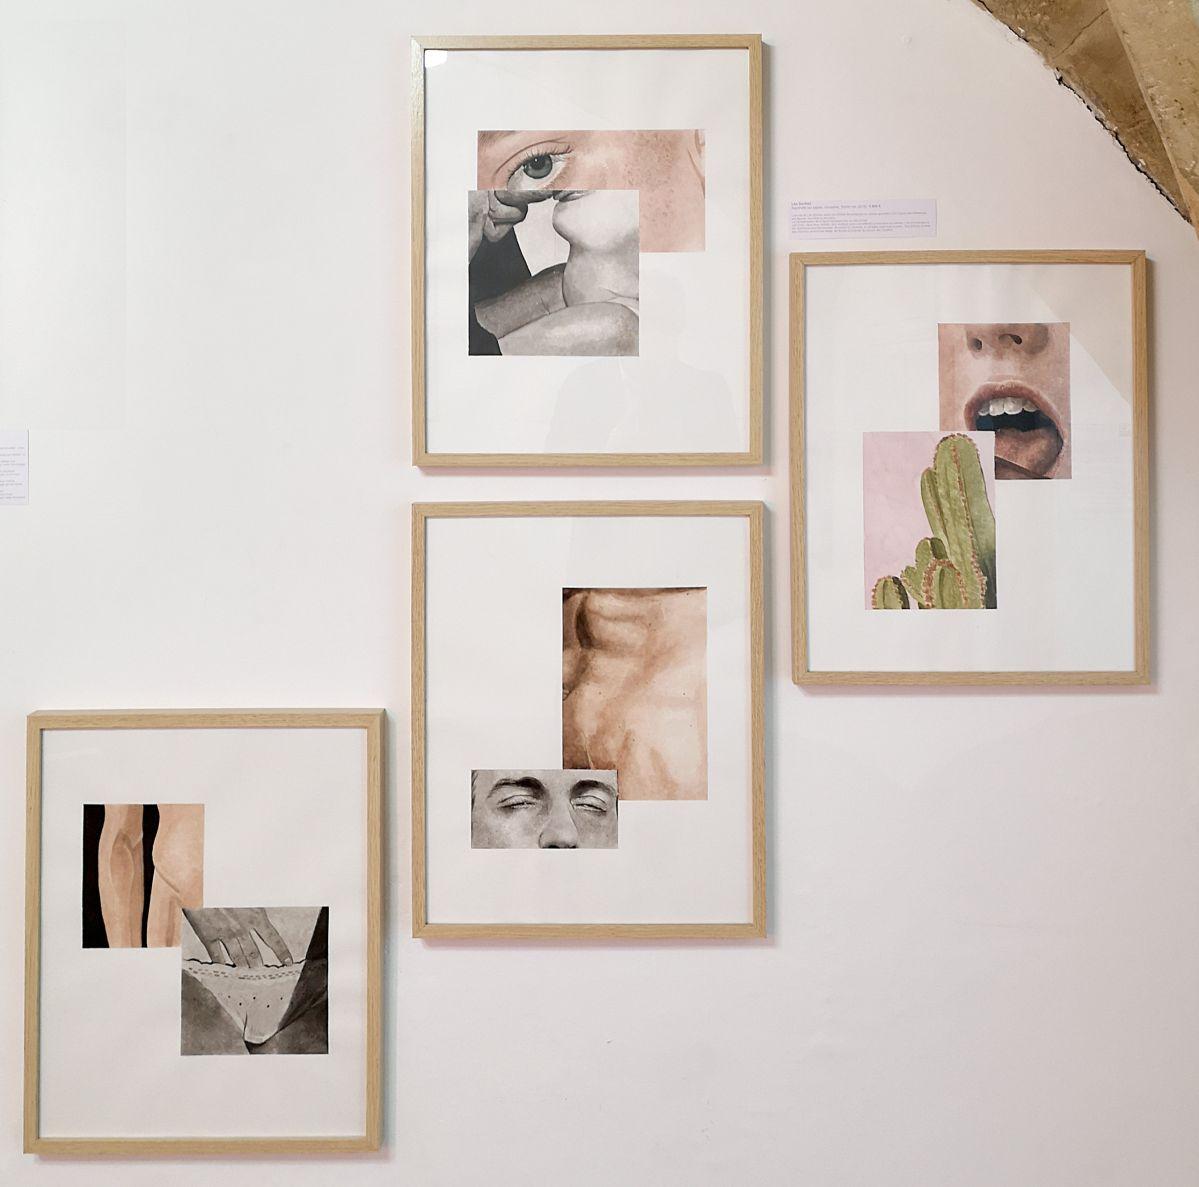 Léo Dorfner - NO PROHIBIDA à la N5 galerie - Vue de l'exposition - Photo En revenant de l'expo !